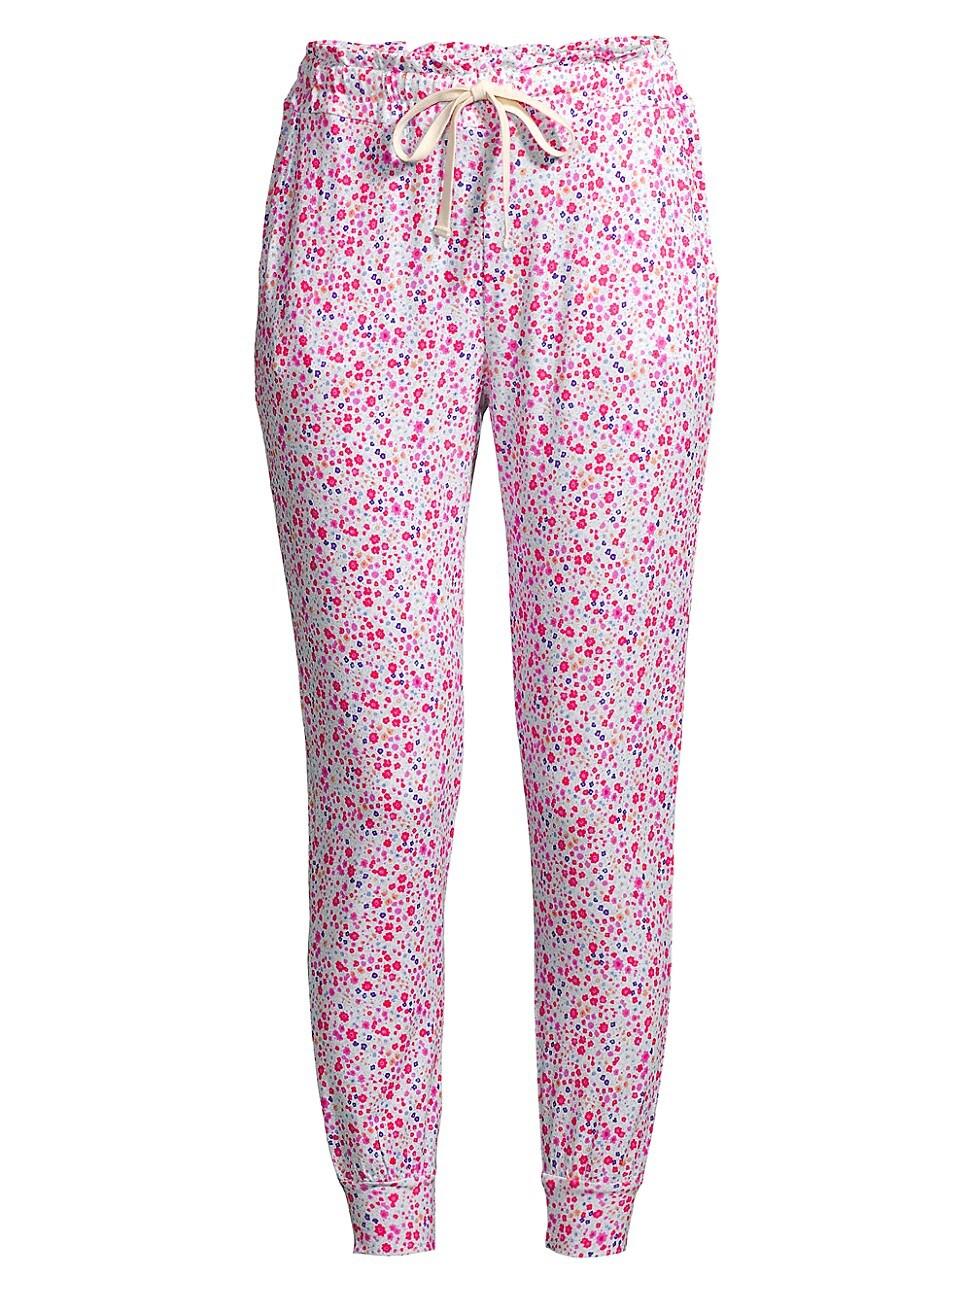 Stripe & Stare Pants WOMEN'S ROSEBAY LOUNGE PANTS